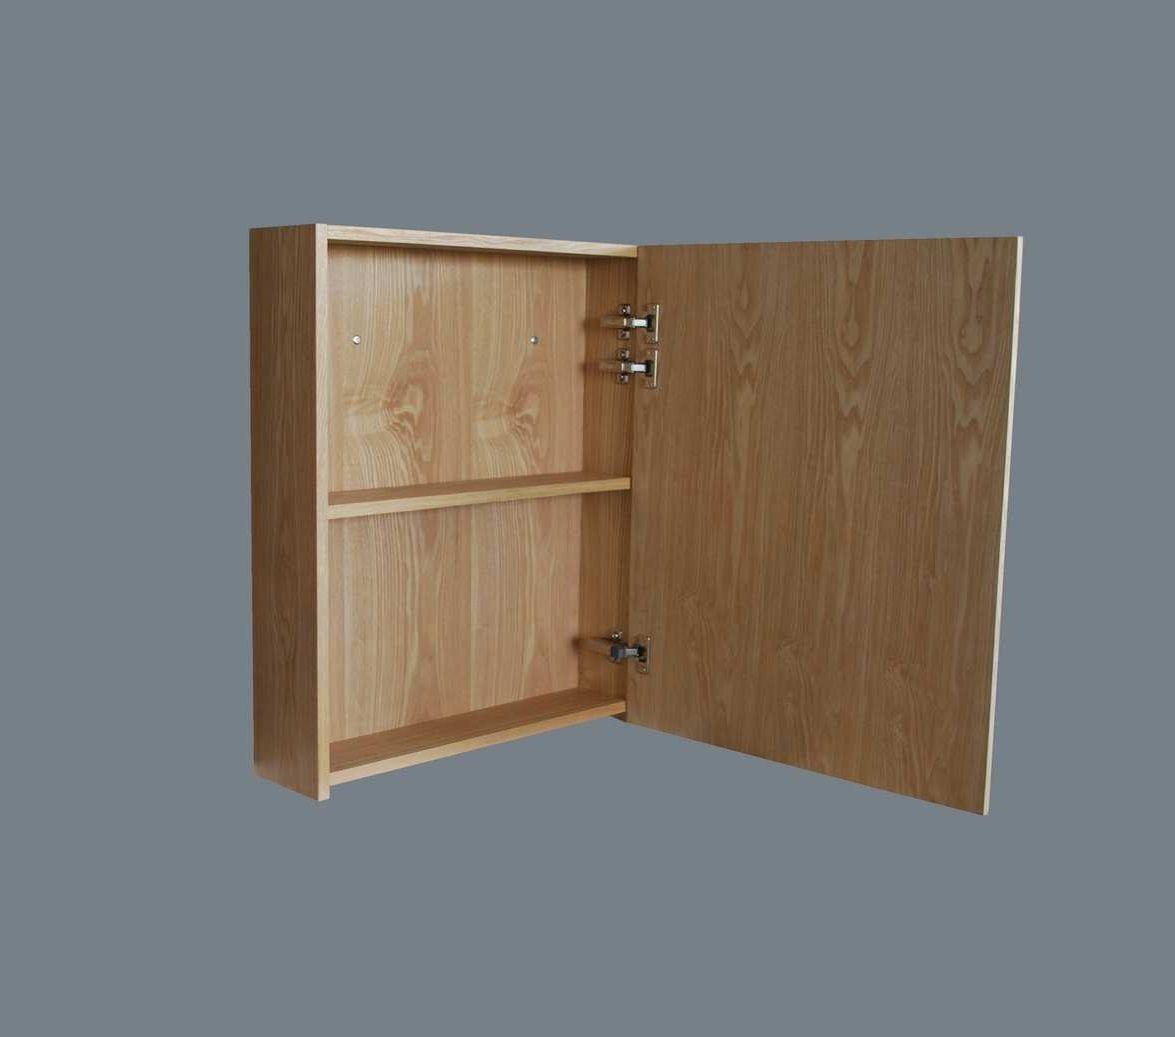 Lambini Designs Wood spiegelkast Eiken 58cm rechts